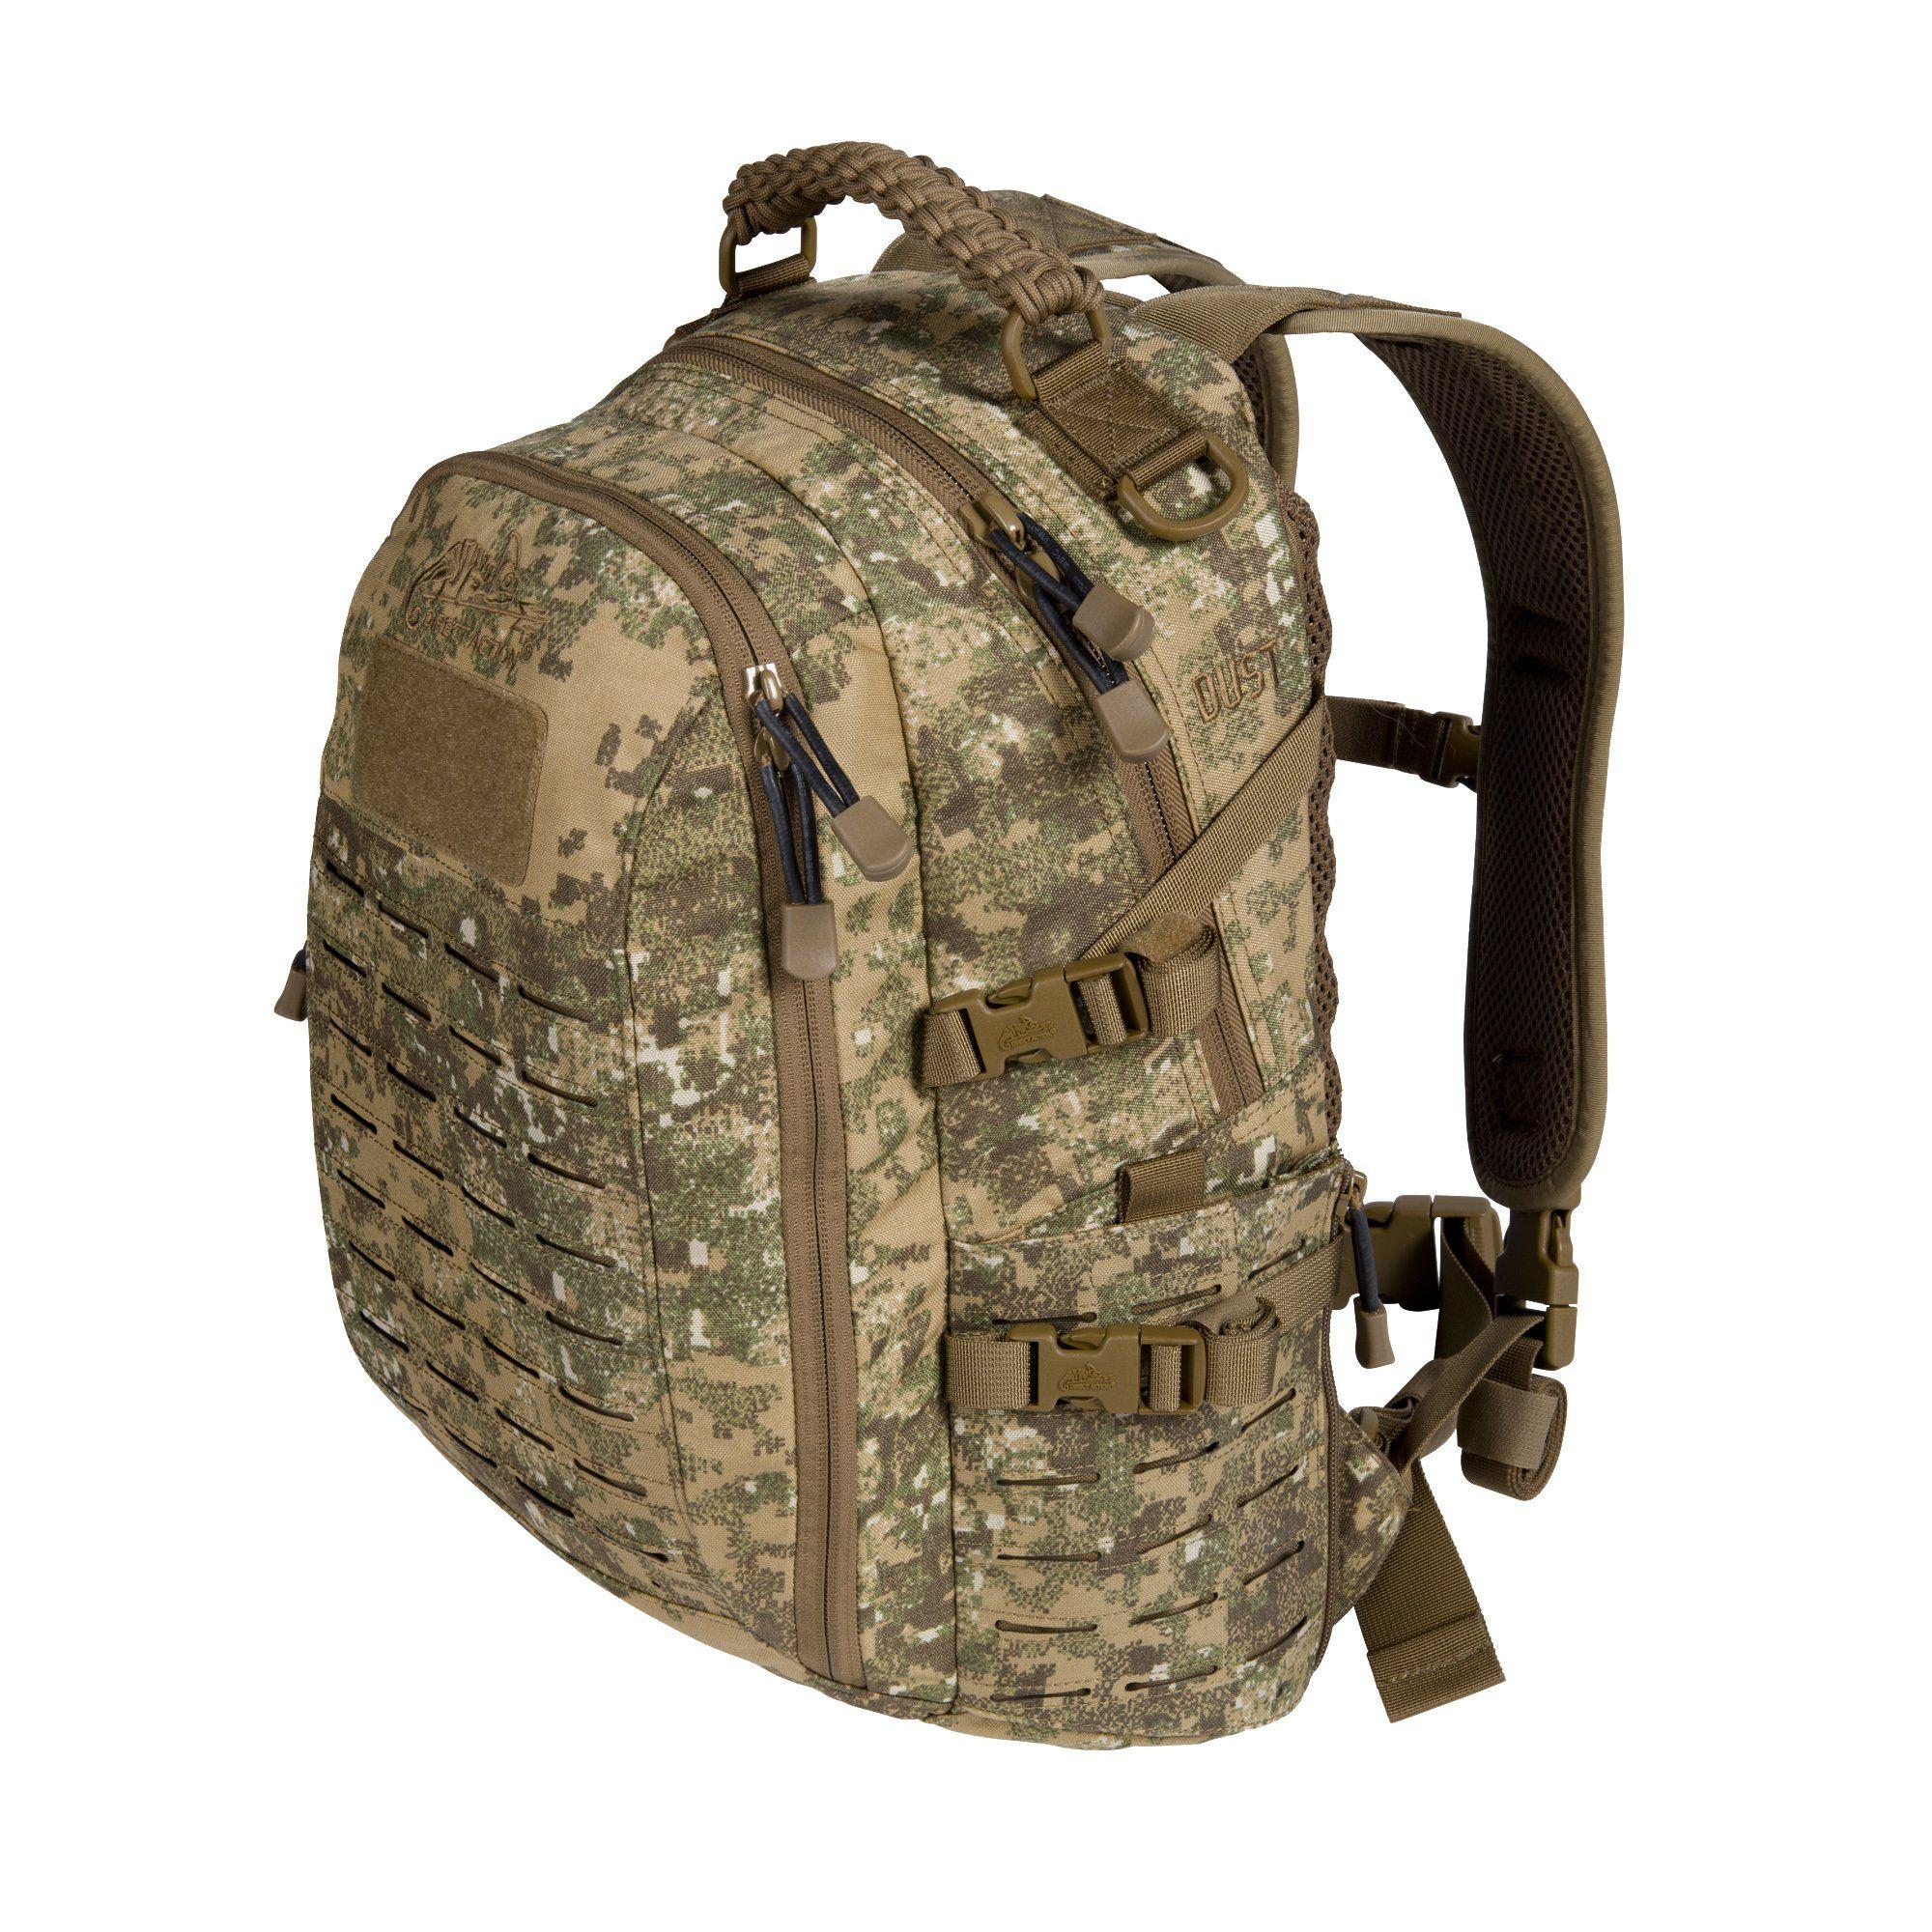 cfc8cde9404f Direct Action Dust Tactical Backpack Pencott Badlands. Dust Mk II have  redesigned side pockets that